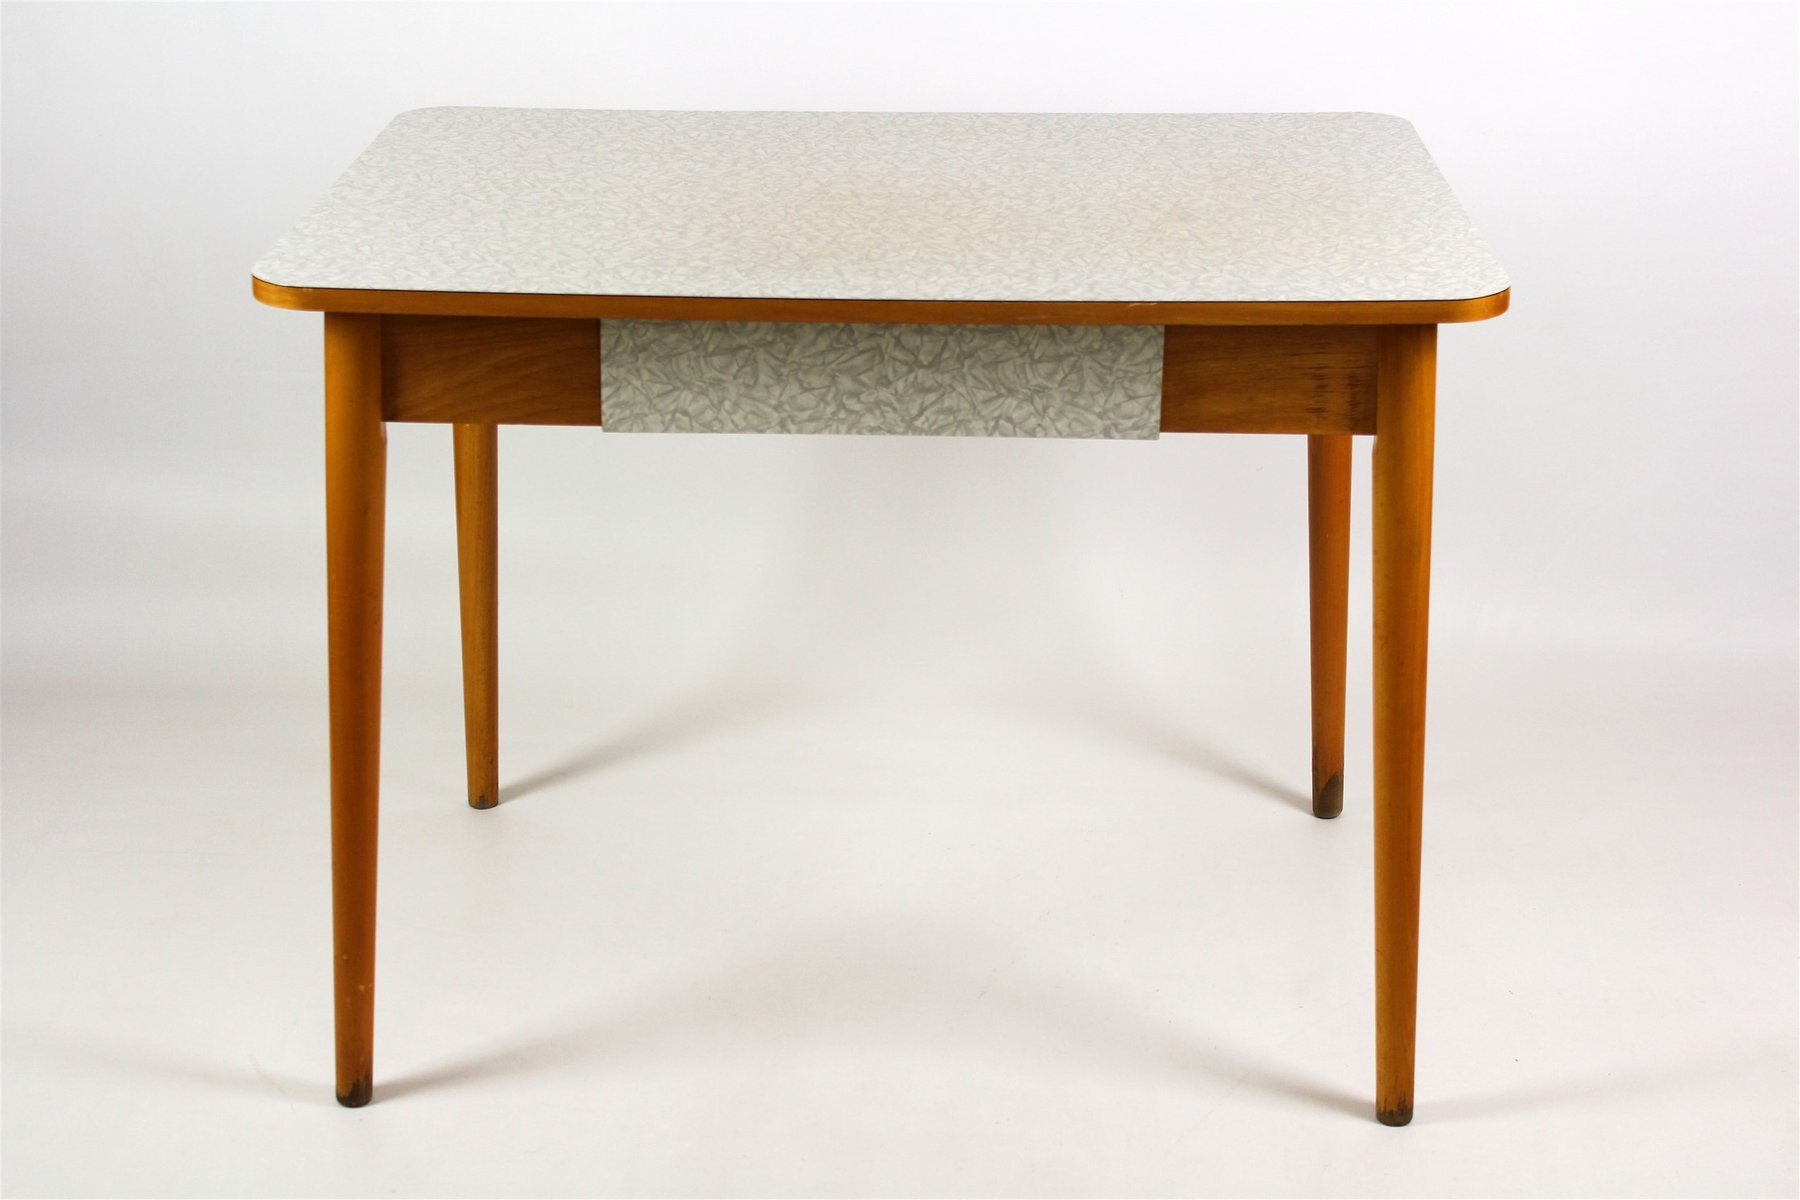 table de cuisine en formica de jitona 1960s en vente sur. Black Bedroom Furniture Sets. Home Design Ideas